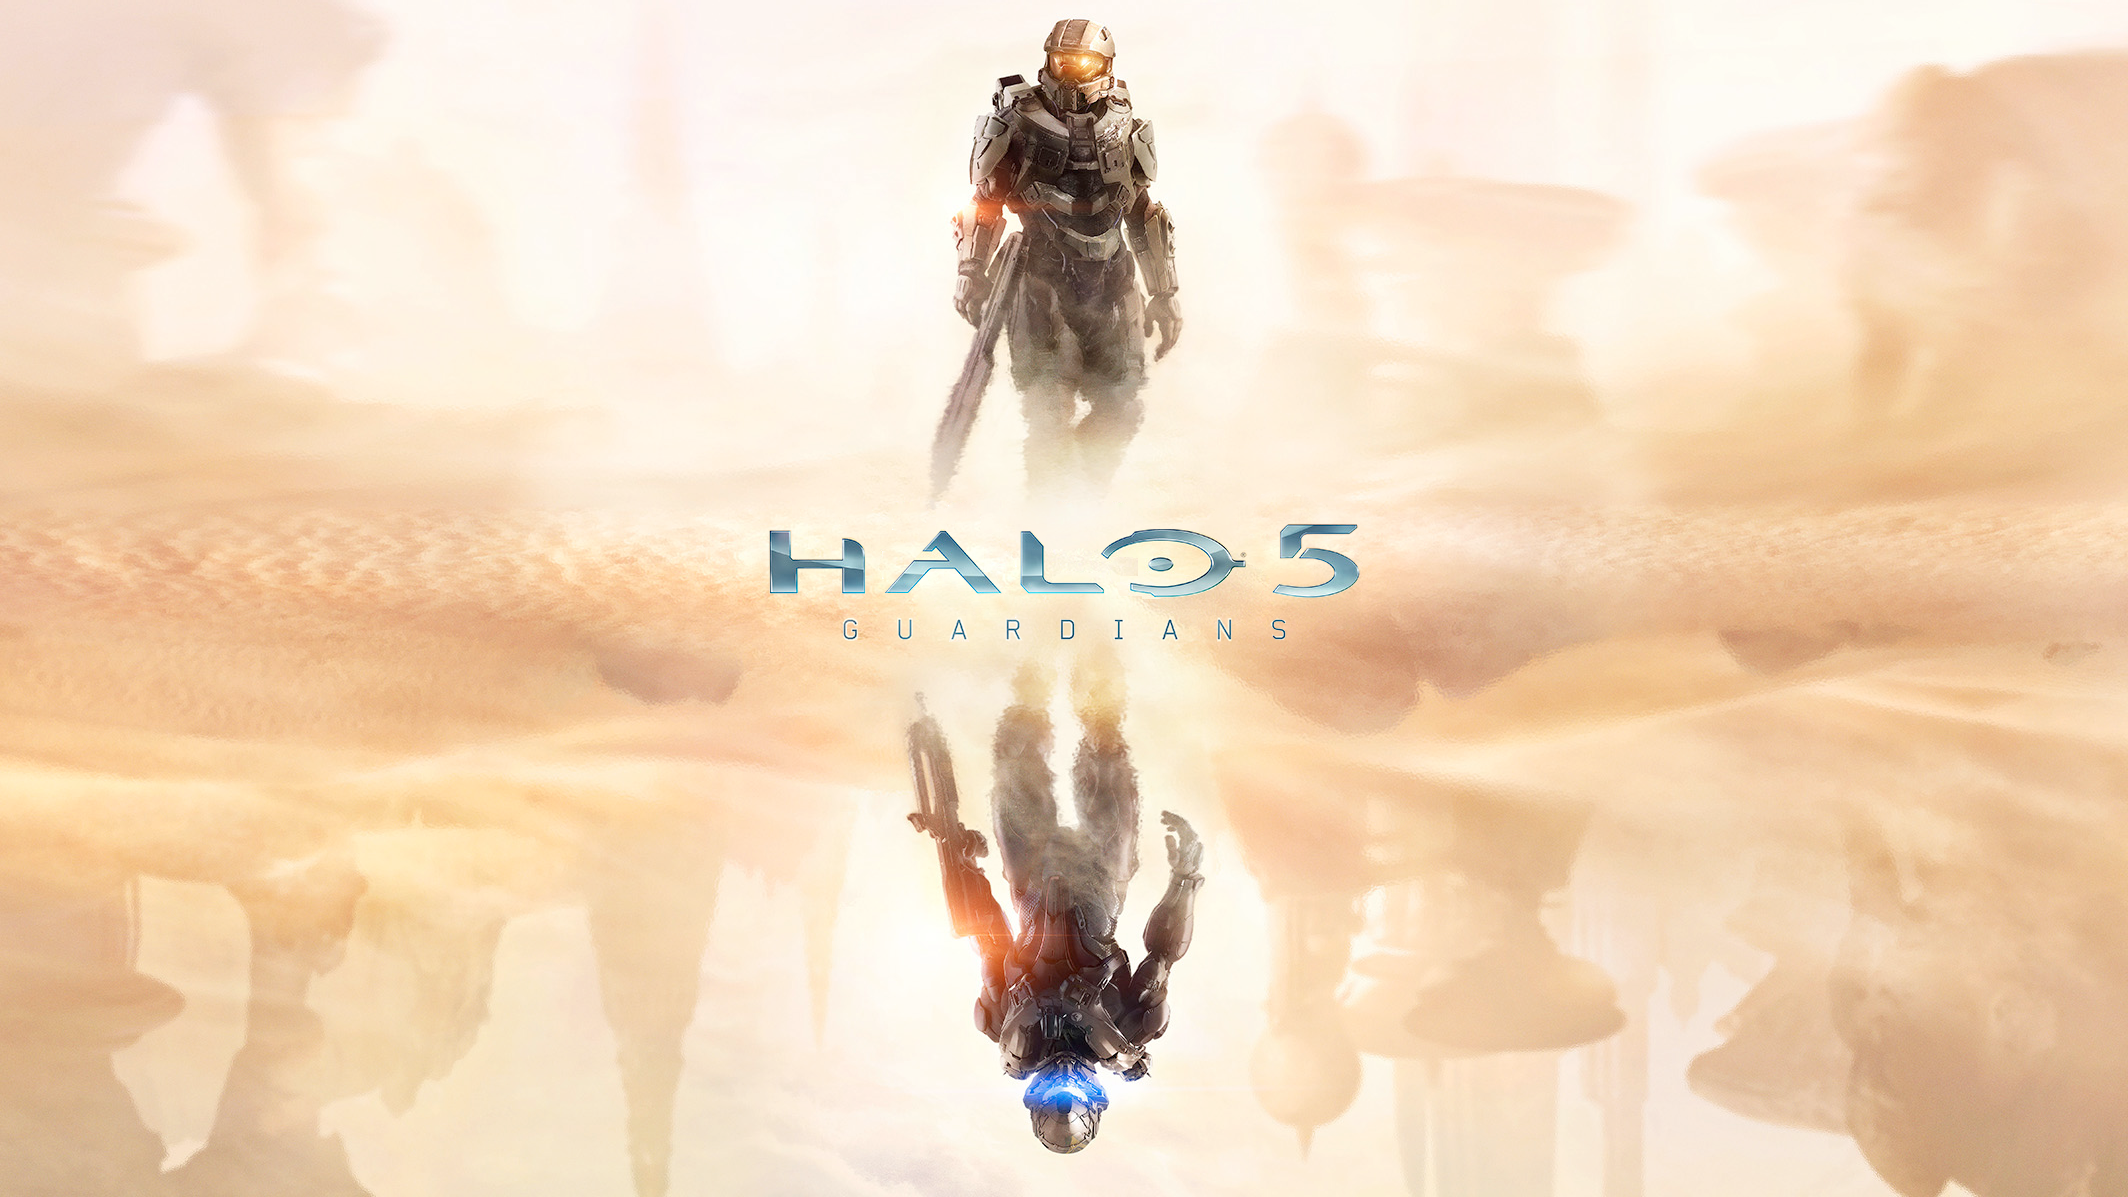 Halo 5 Shadow Mirror Wallpaper HD 2128x1197